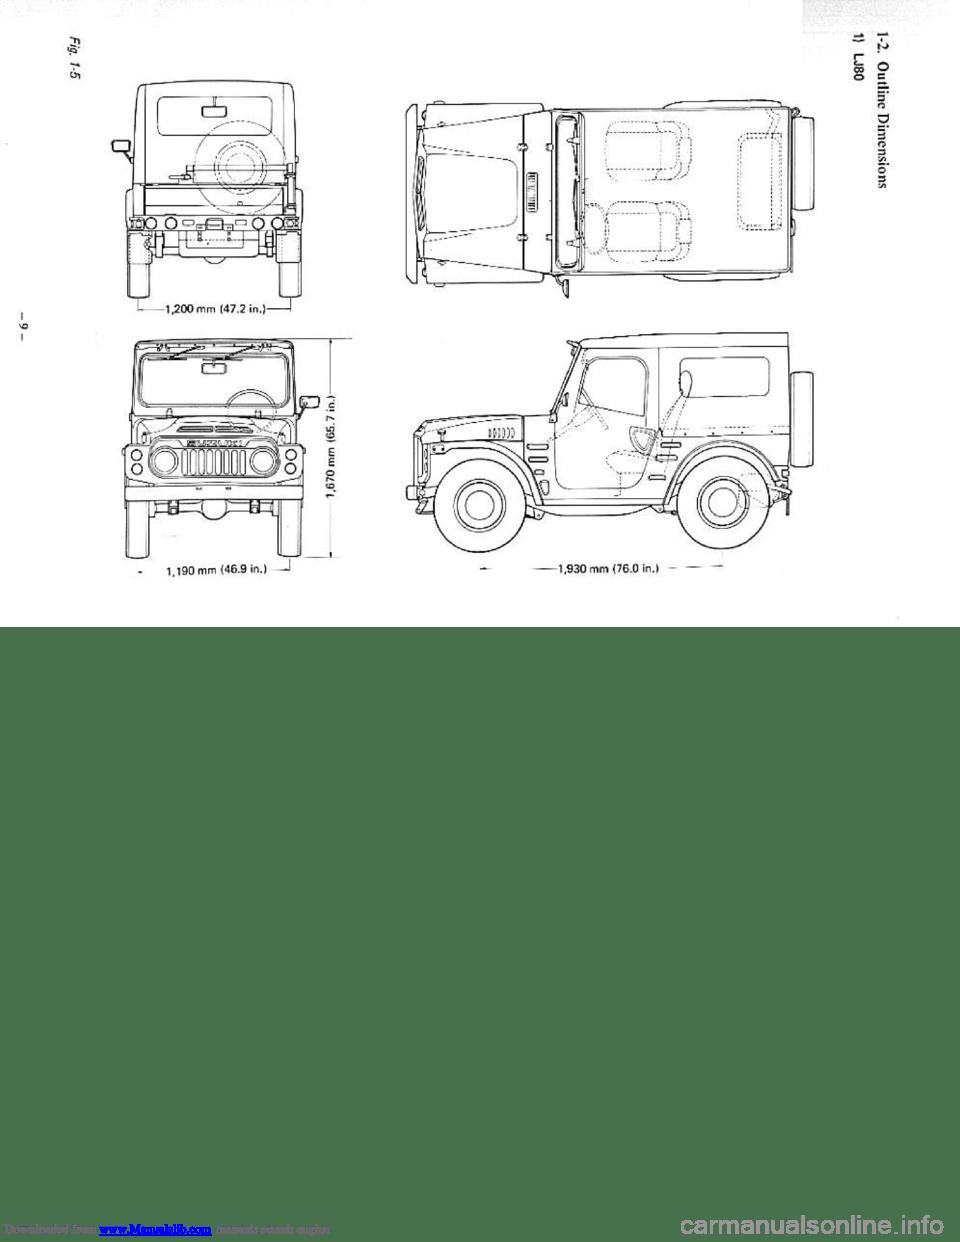 SUZUKI LJ80 1979 1.G Service Workshop Manual (295 Pages)